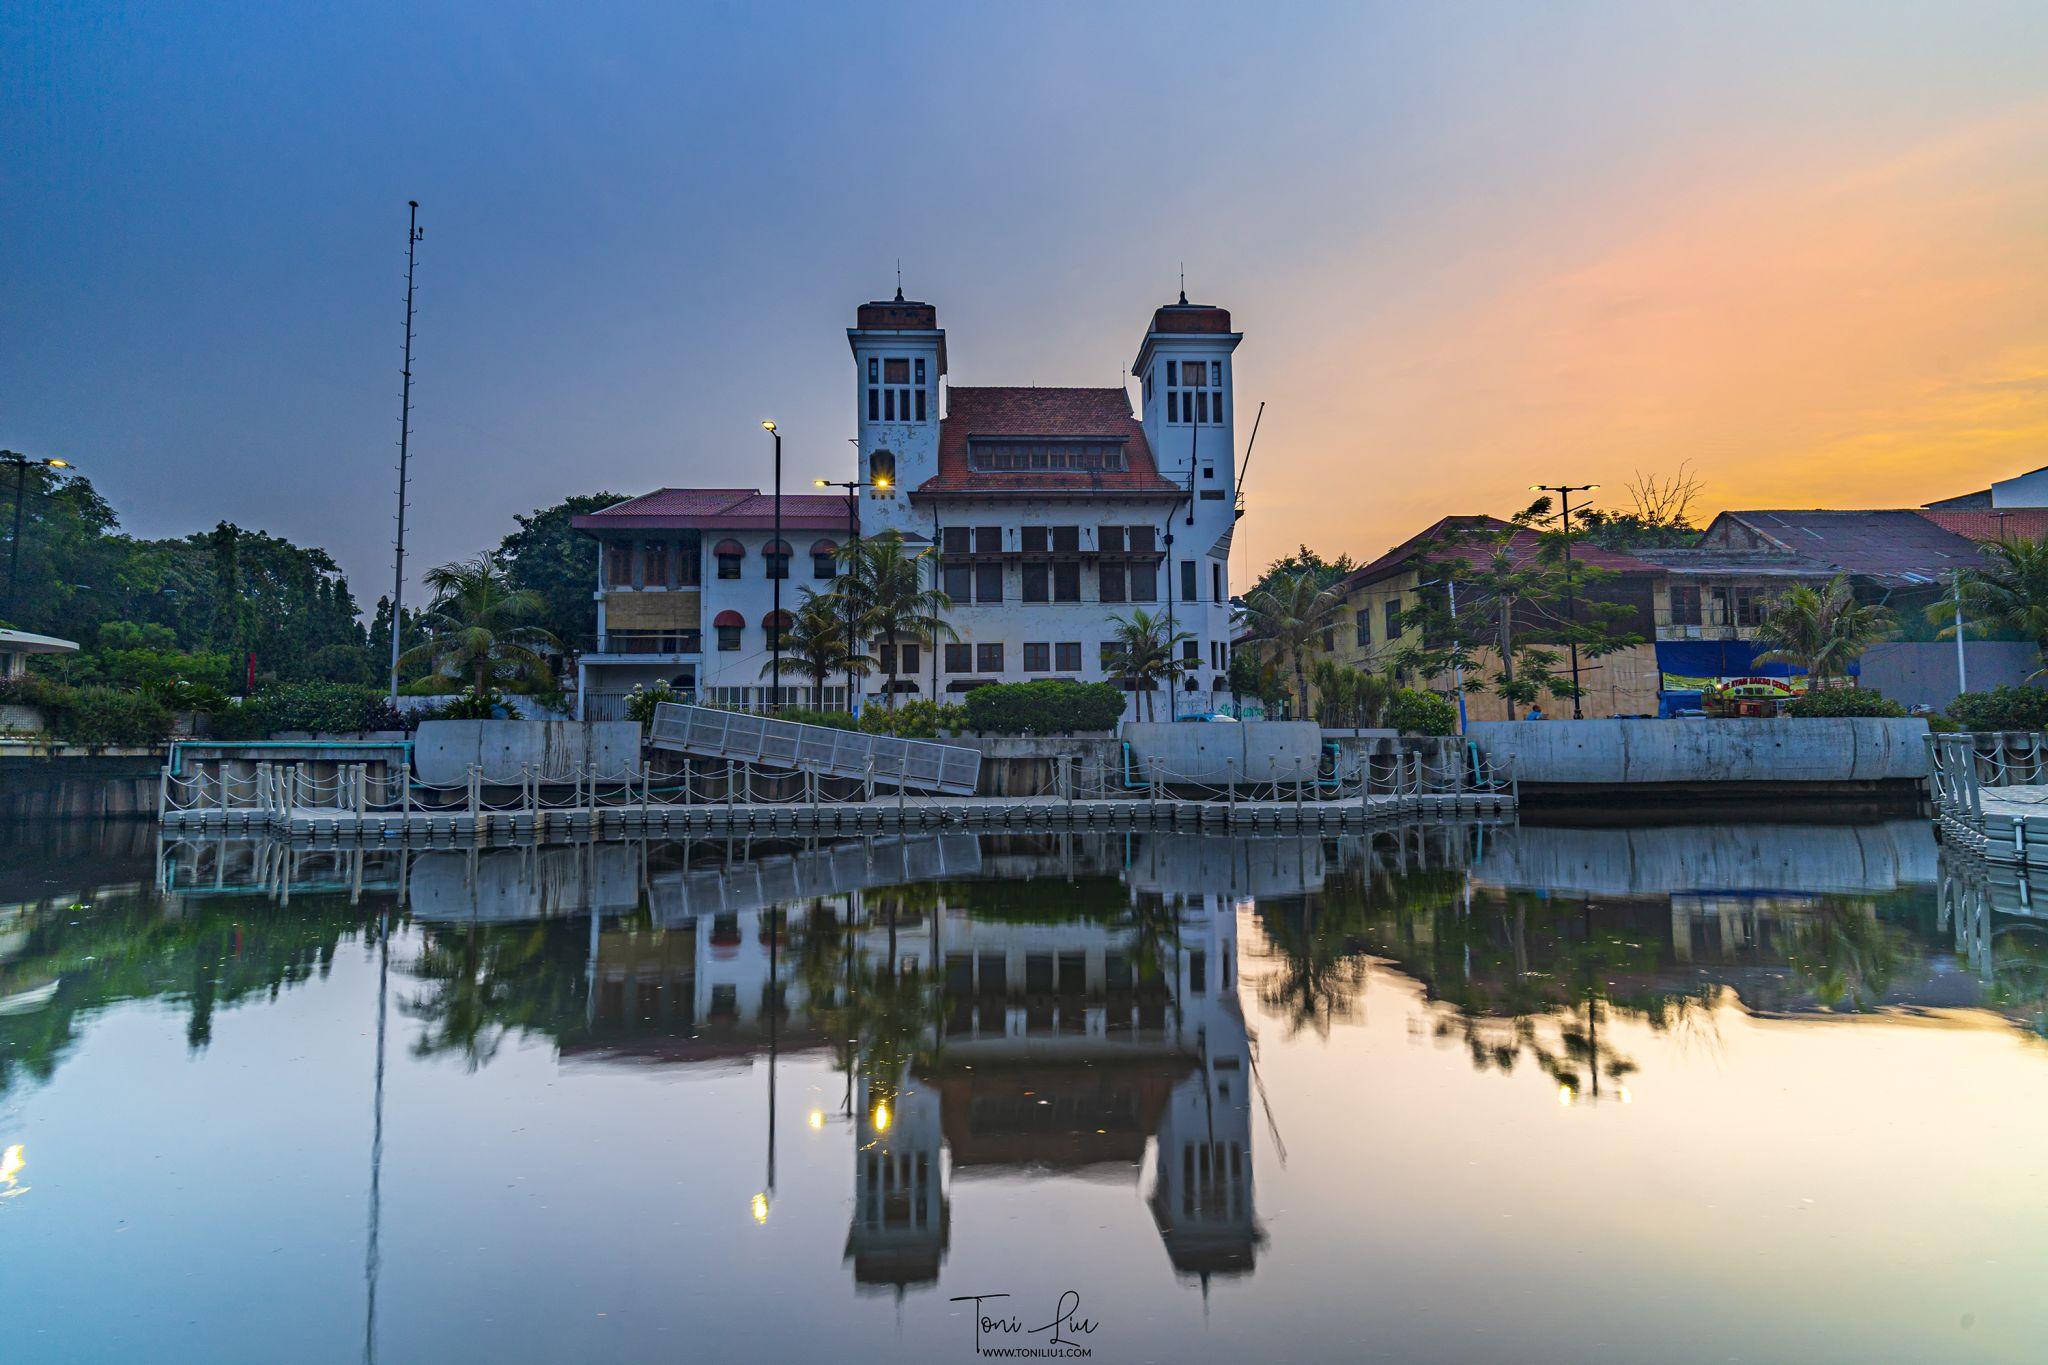 Jakarta Old Town (Krukut River), Indonesia